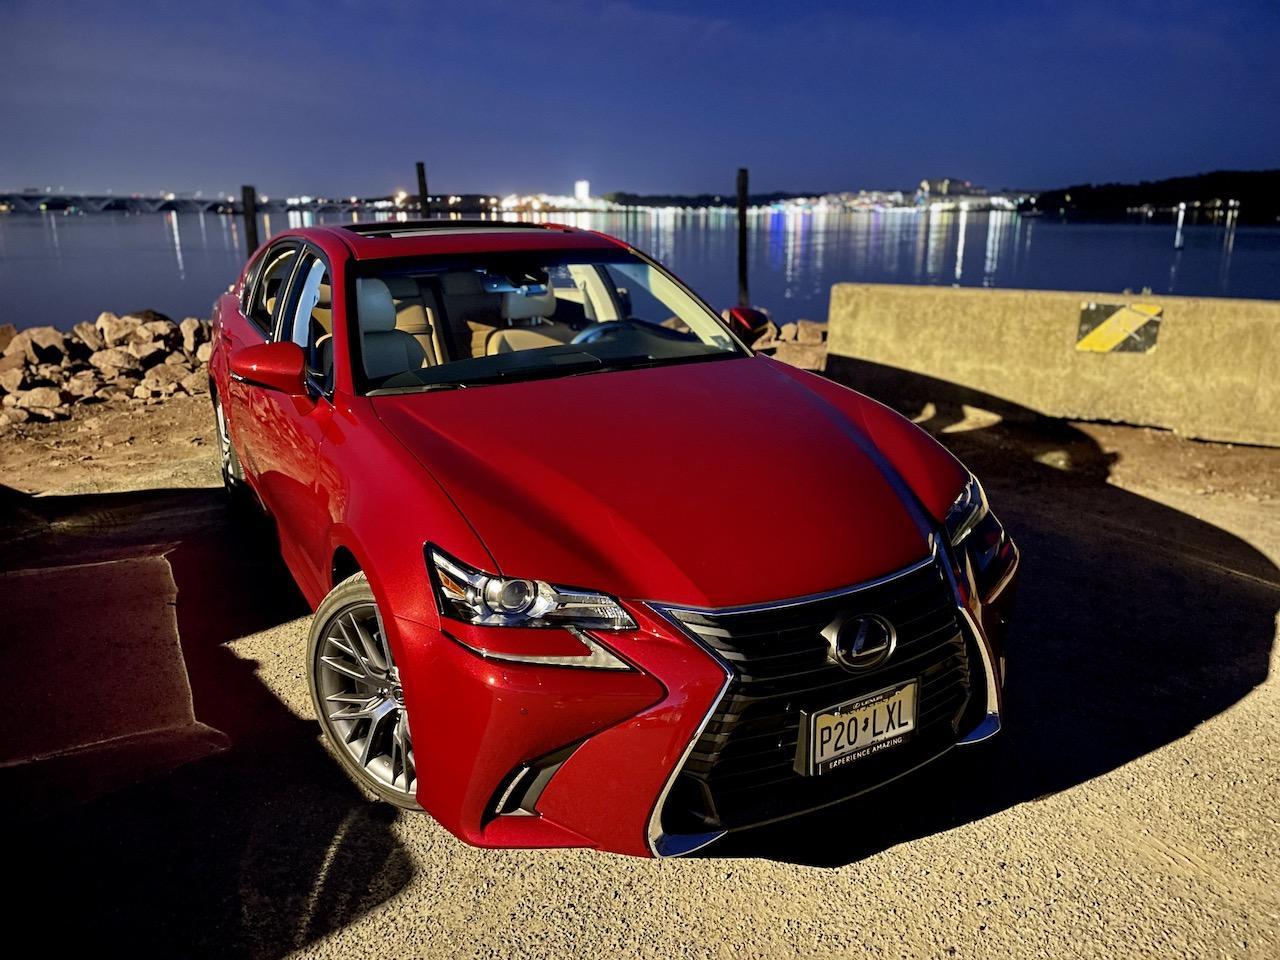 2020 Lexus GS350 red